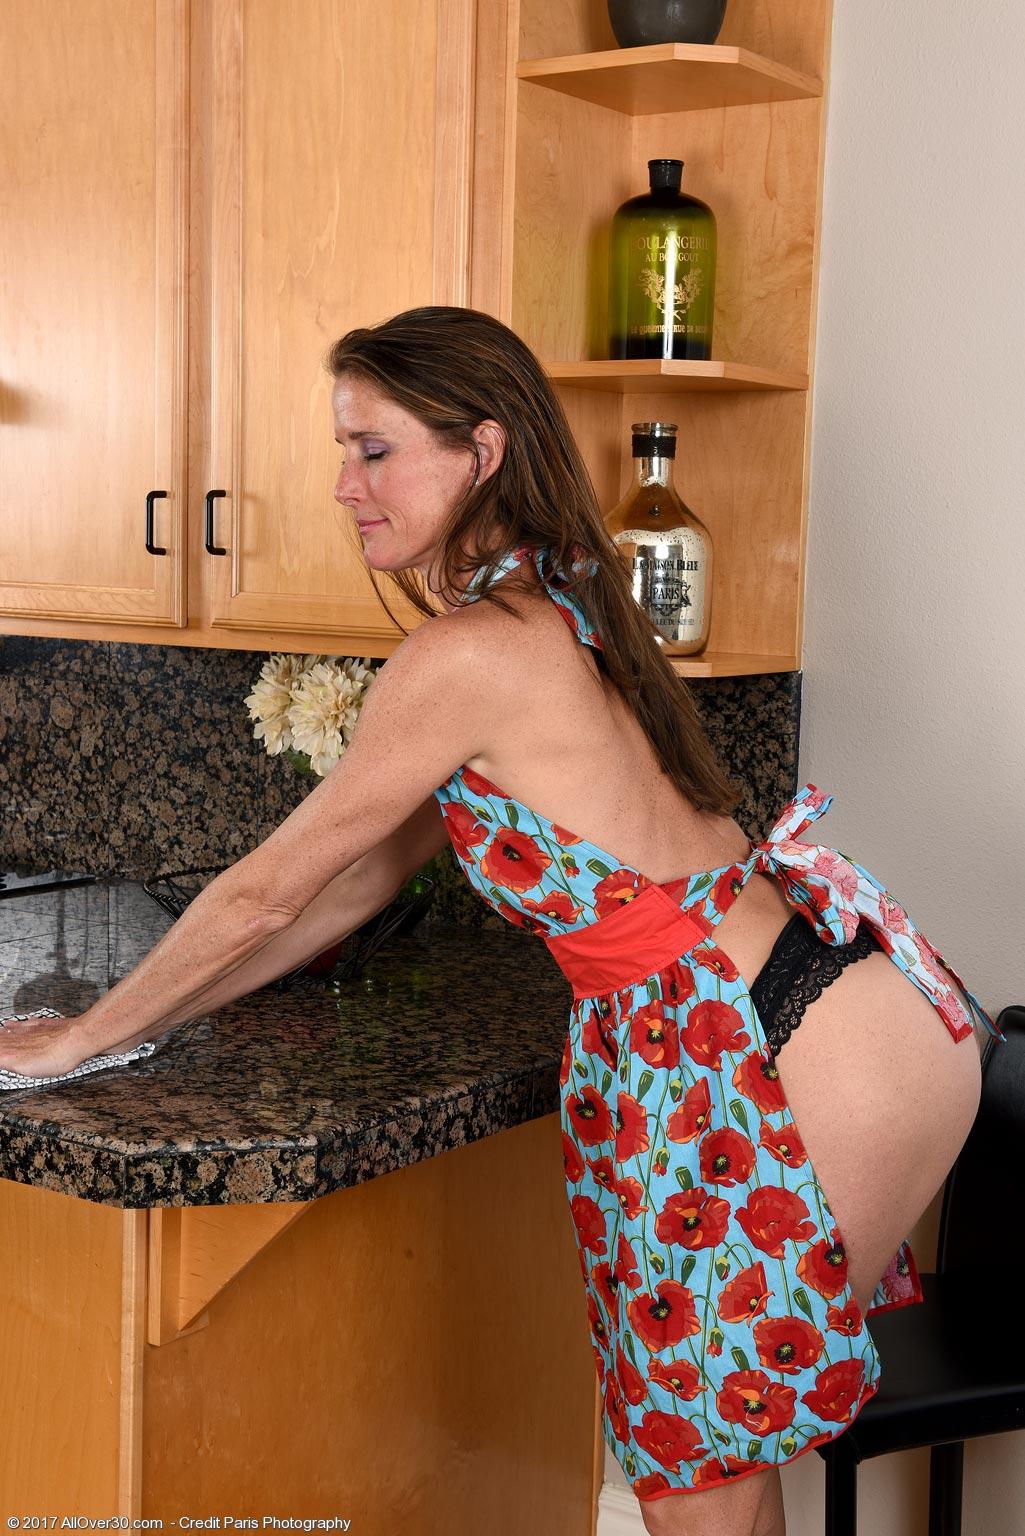 sofie marie kitchen striptease